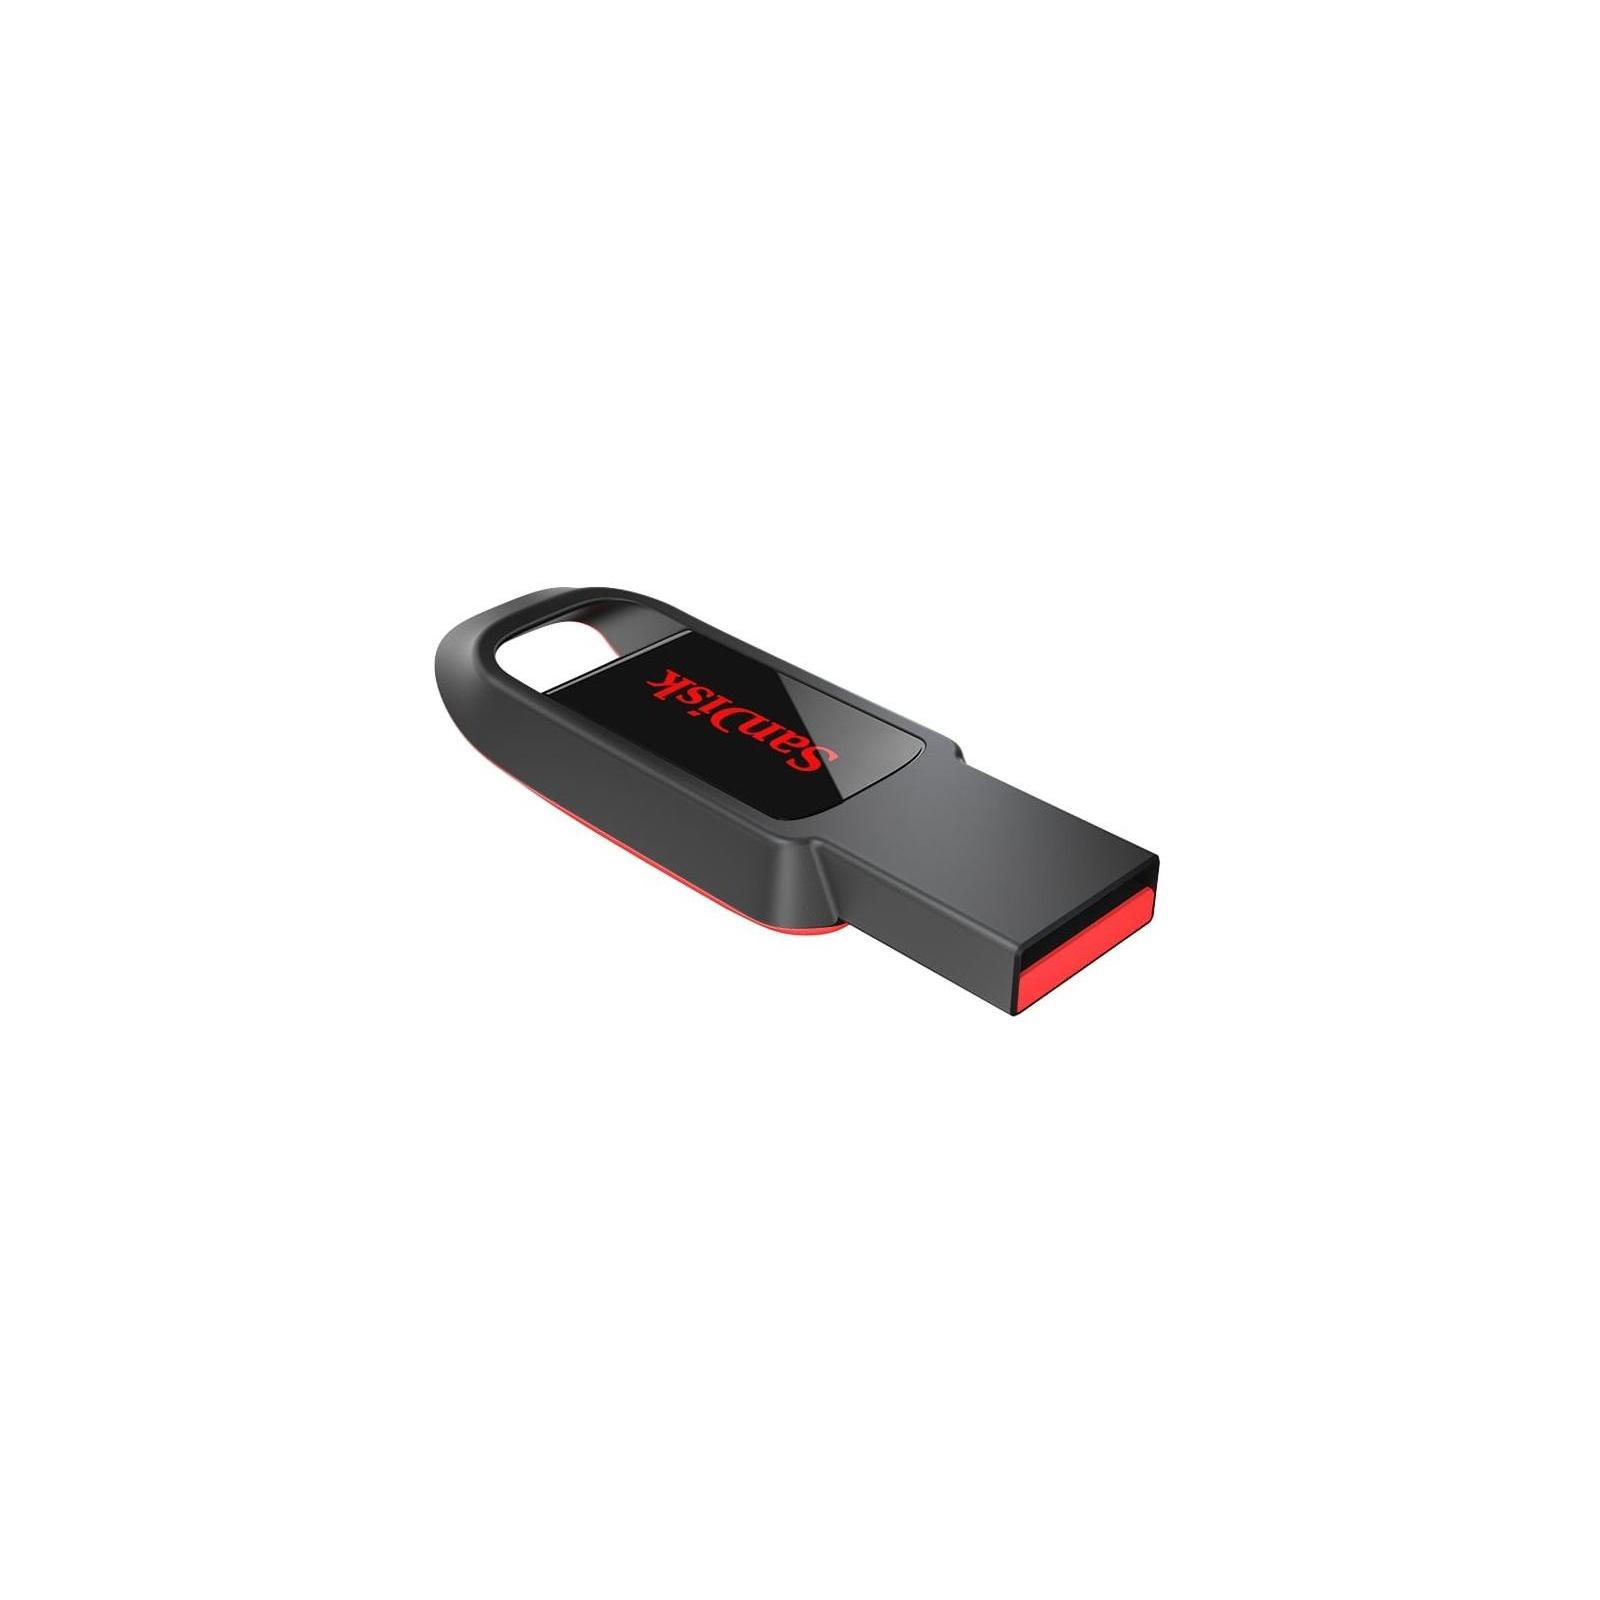 USB флеш накопитель SanDisk 16GB Cruzer Spark USB 2.0 (SDCZ61-016G-G35) изображение 4